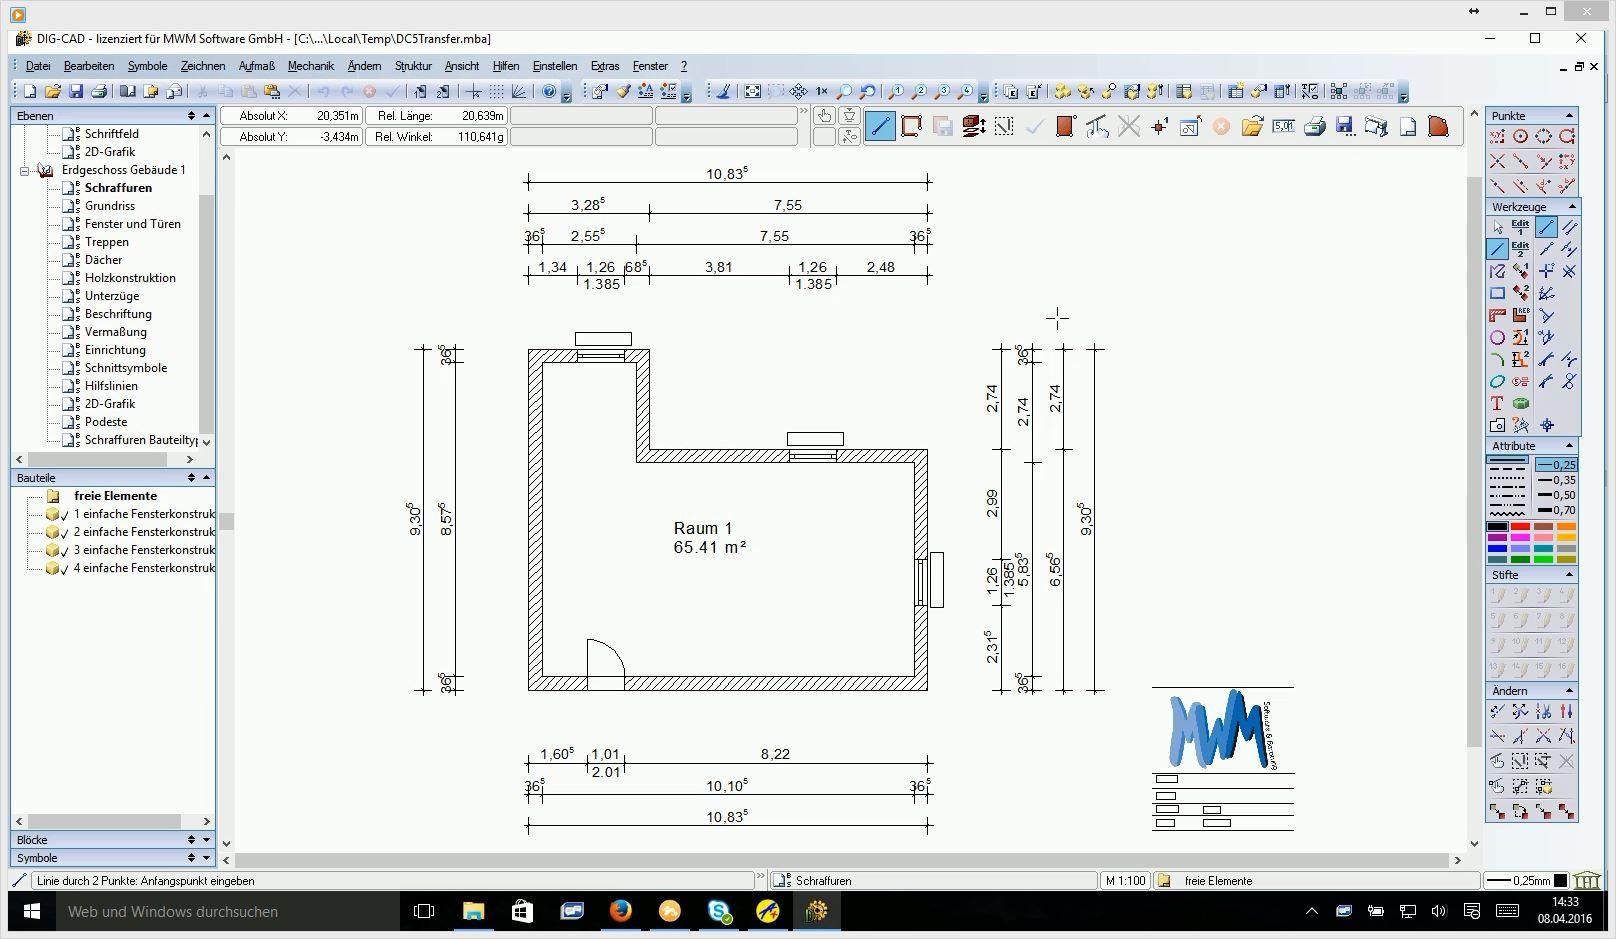 mwm software beratung gmbh software preise arcon f r mwm libero arbeitsweise. Black Bedroom Furniture Sets. Home Design Ideas